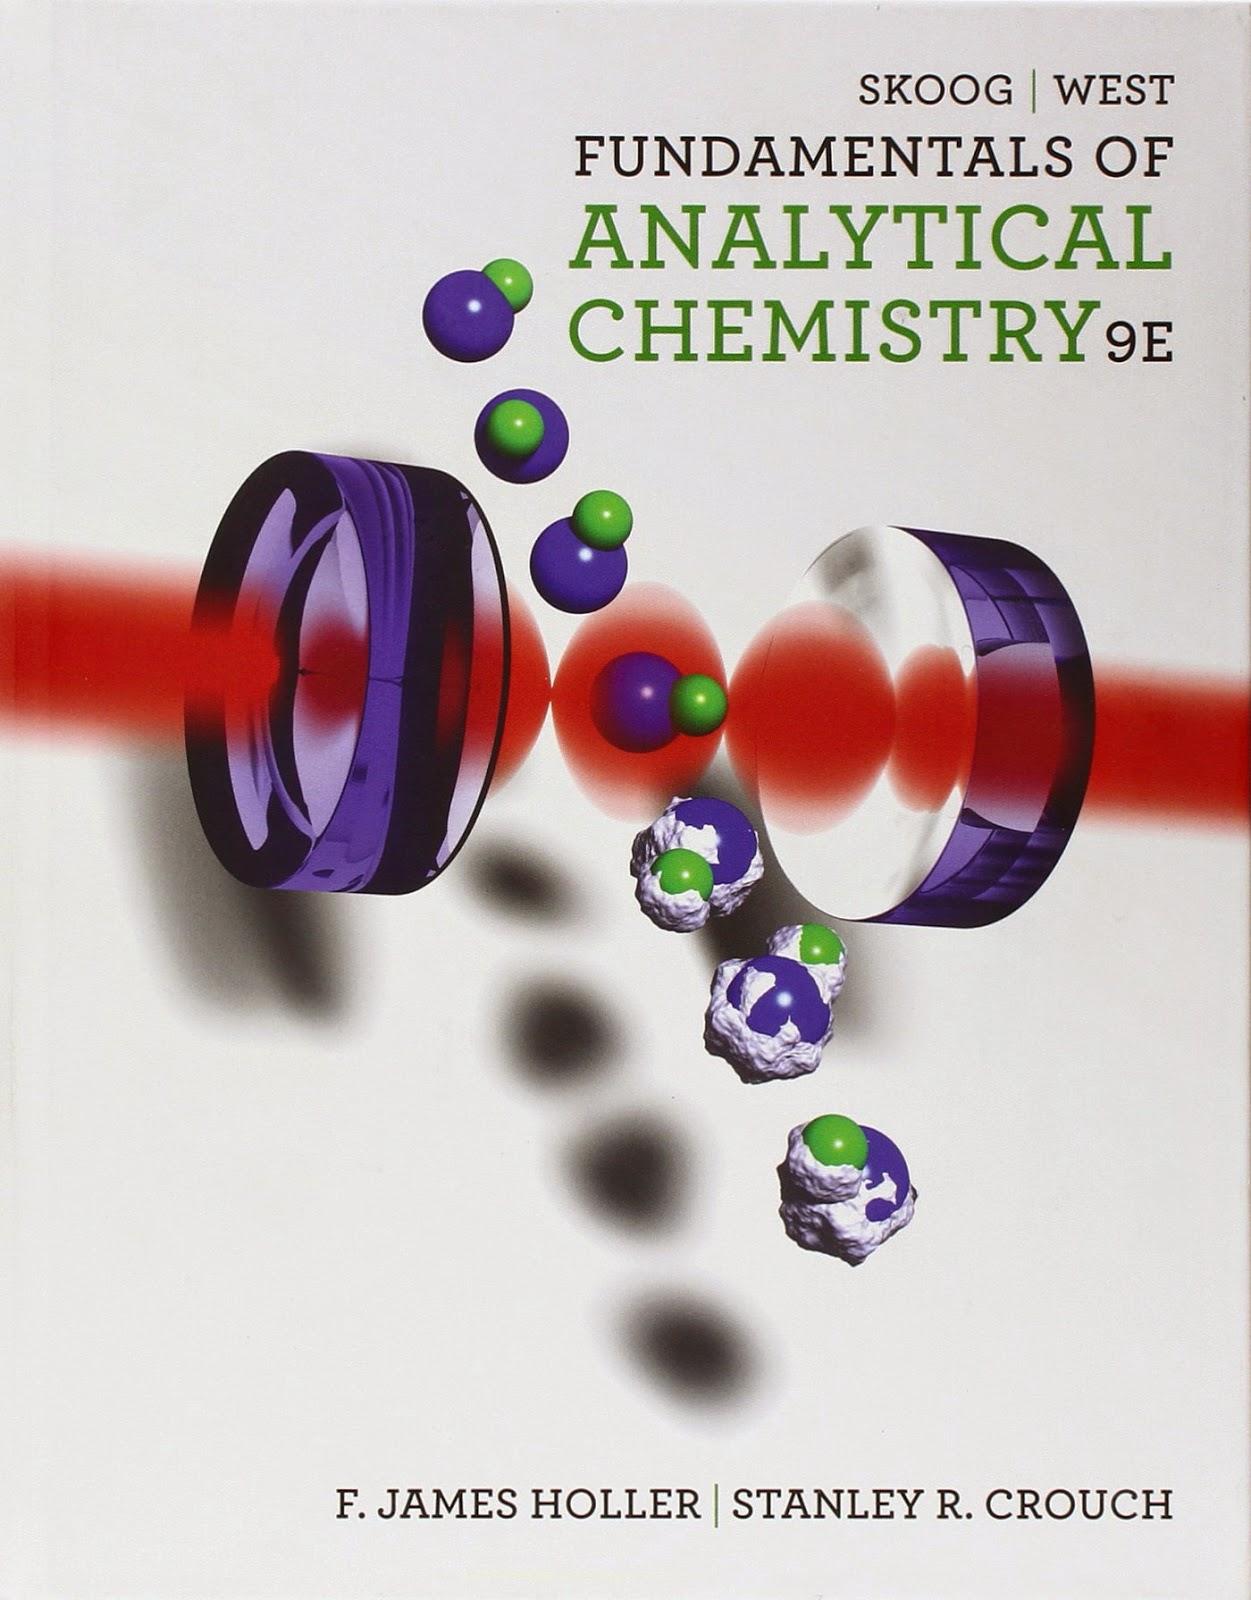 http://kingcheapebook.blogspot.com/2014/08/fundamentals-of-analytical-chemistry.html